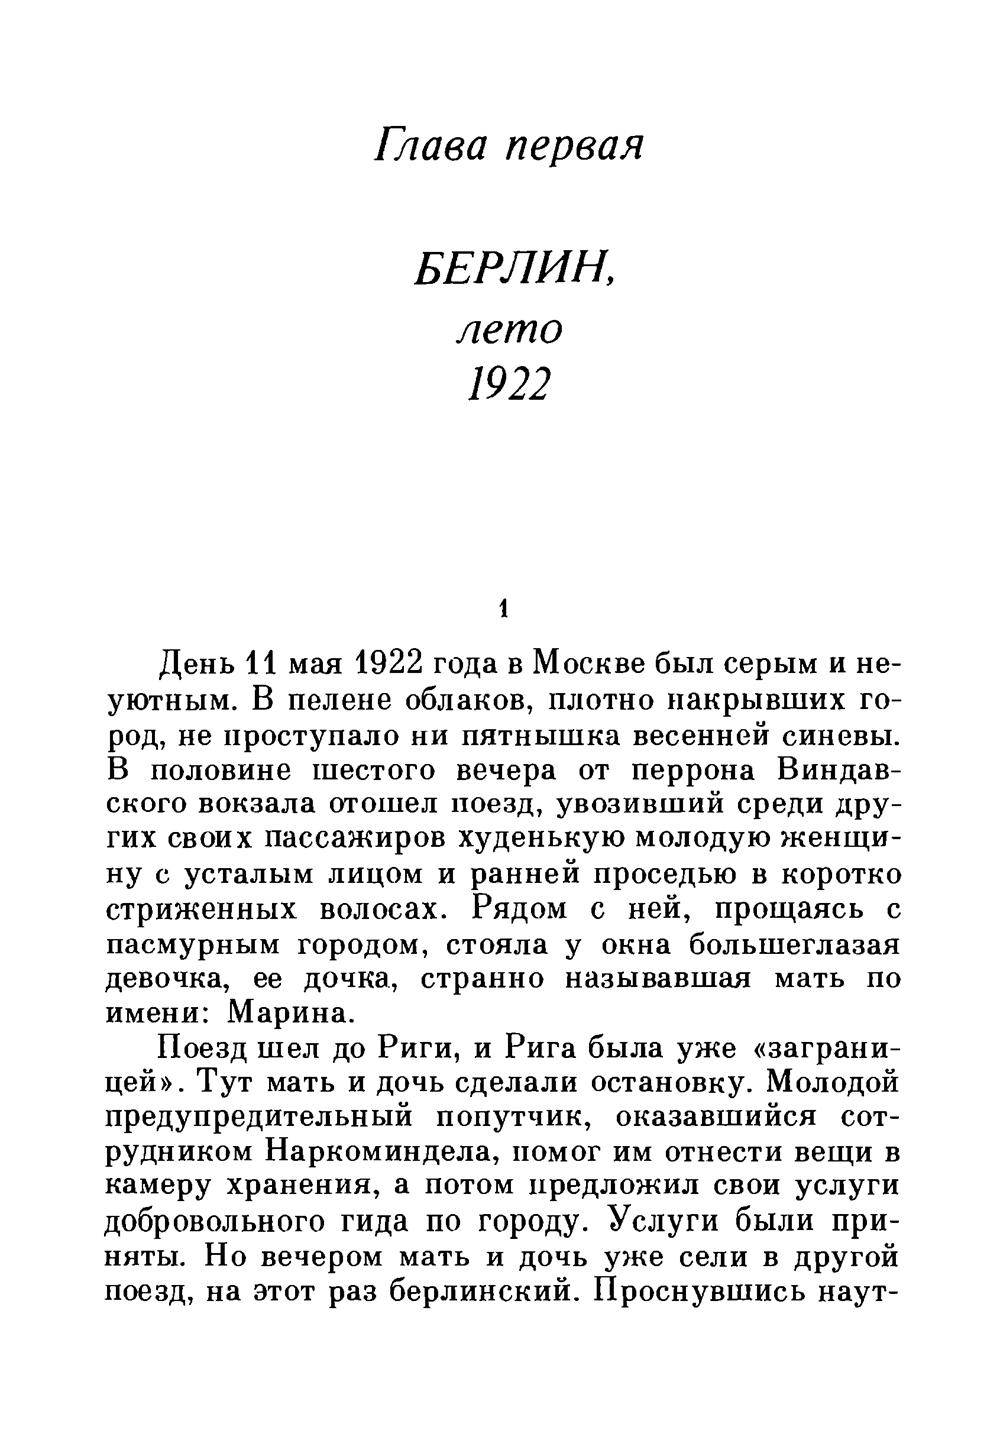 http://i6.imageban.ru/out/2014/10/30/f3a6d2697ce16c850786fc7b14b835ab.jpg